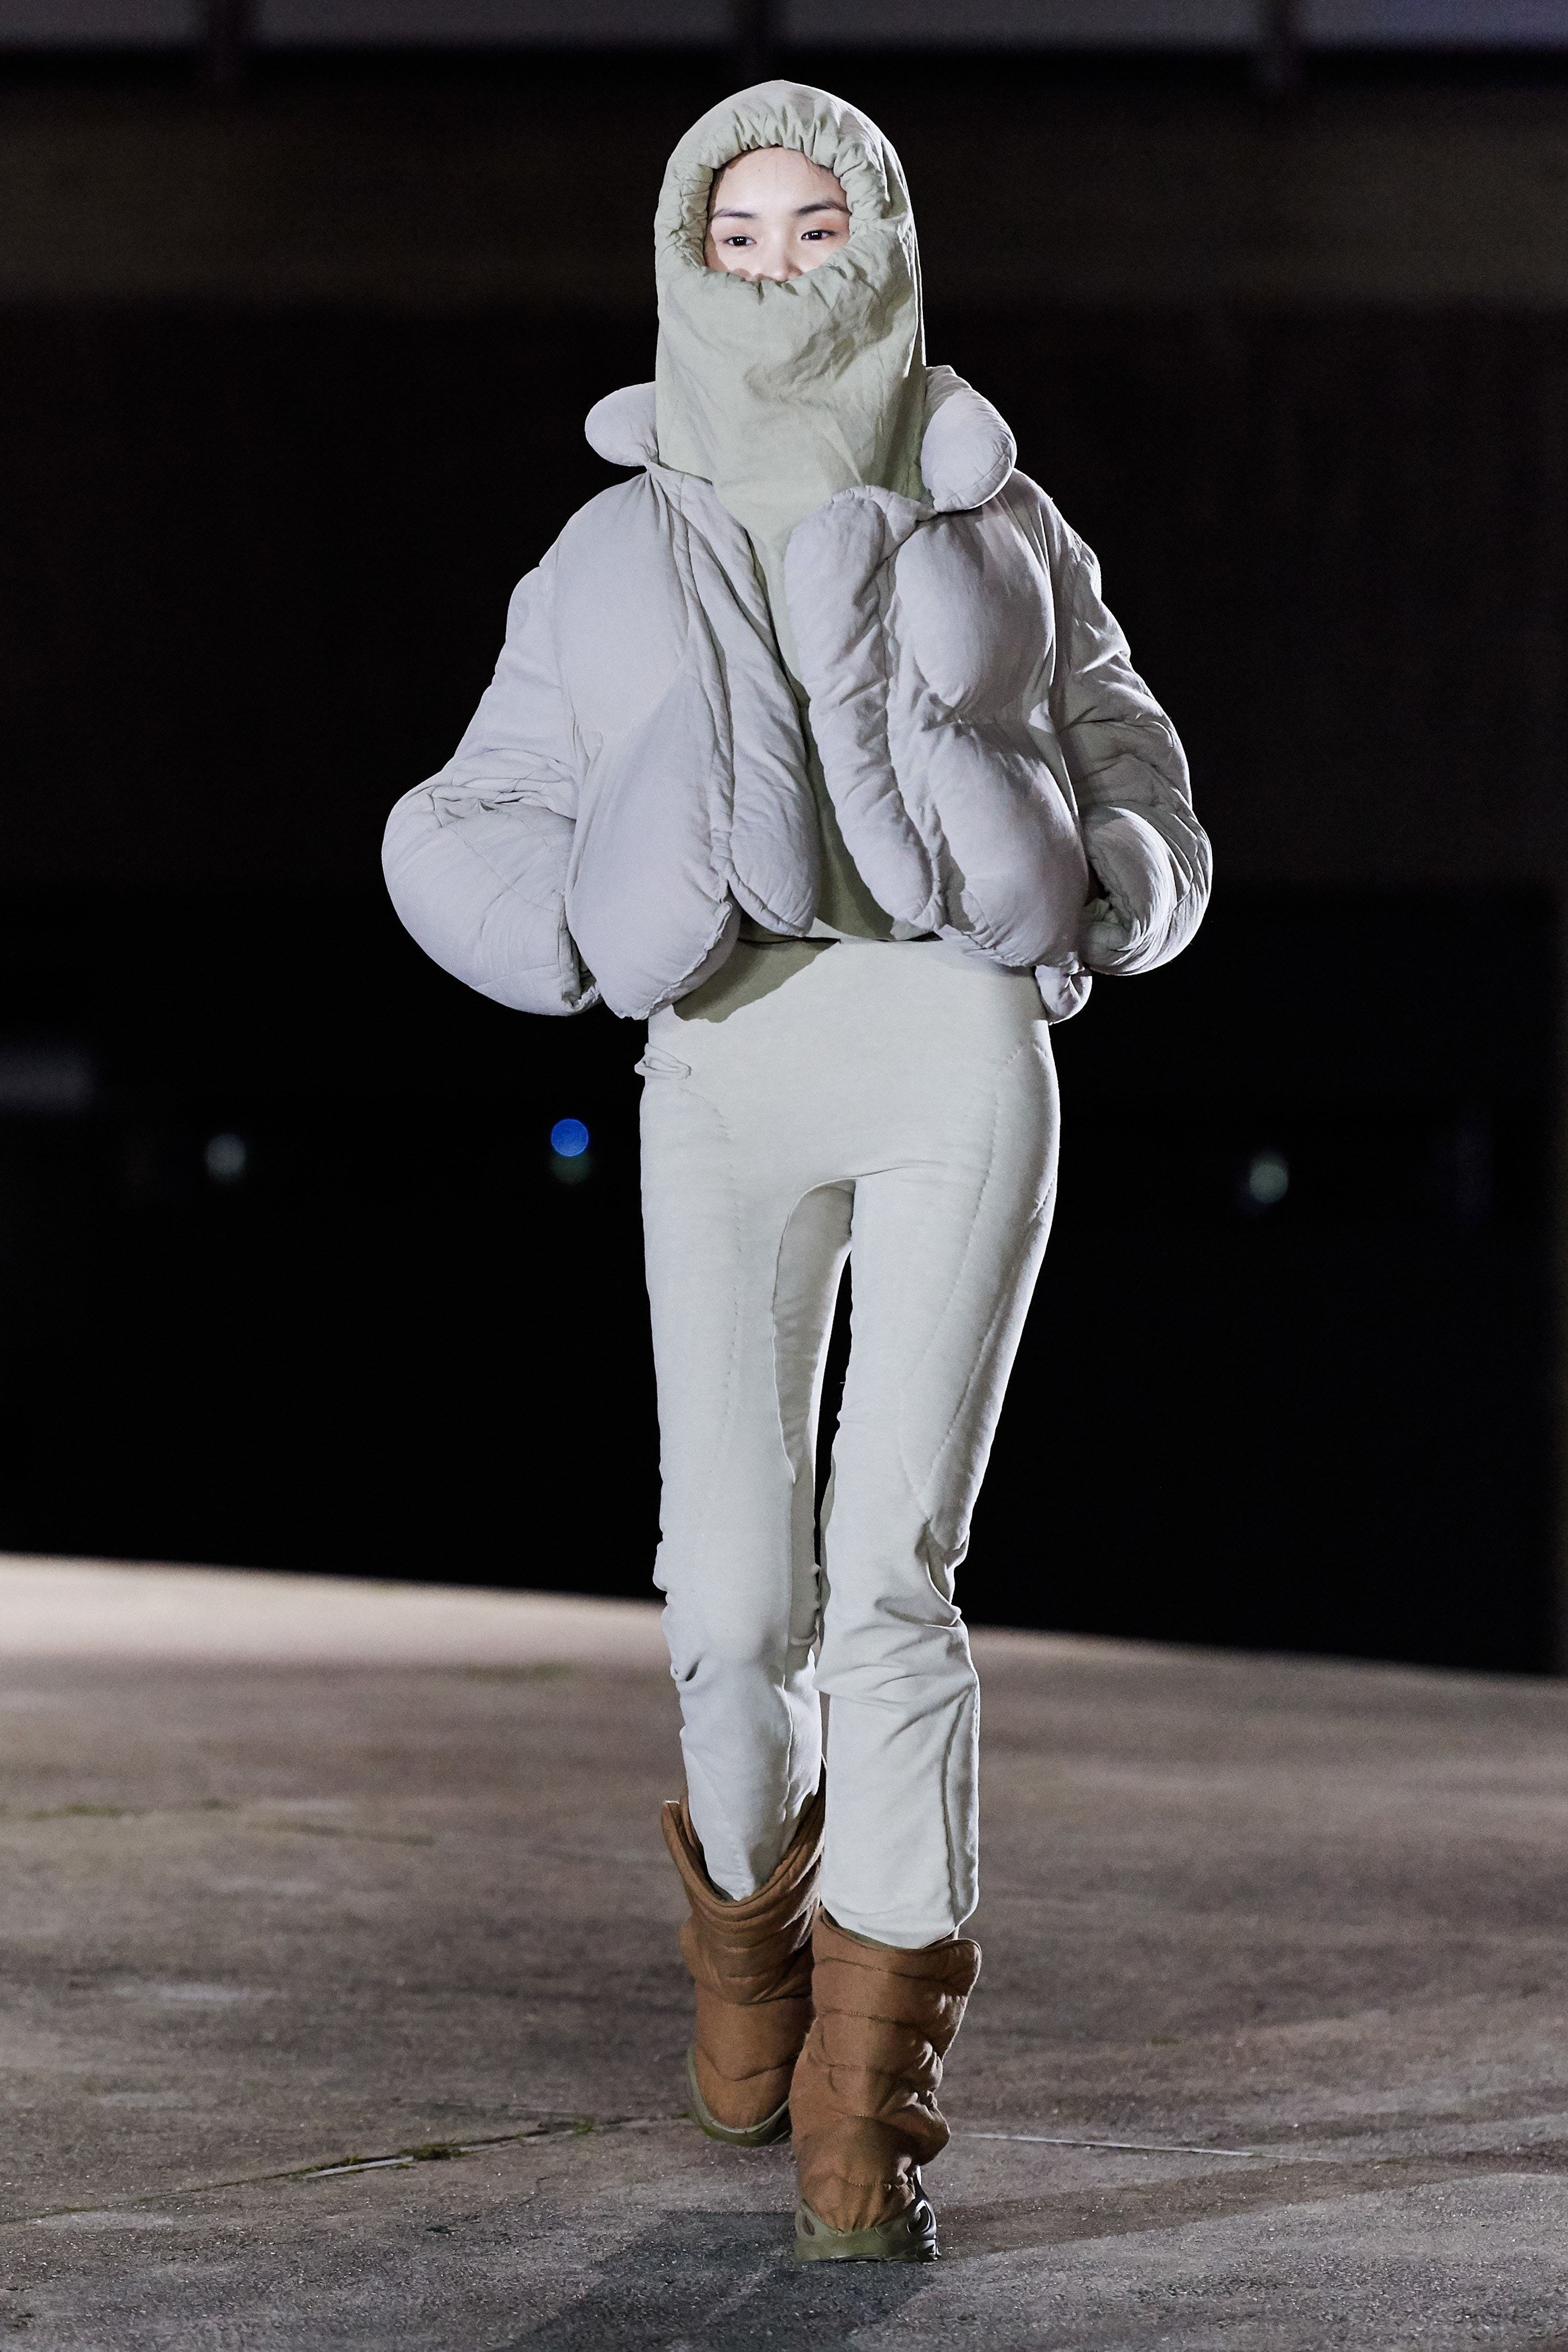 Yeezy Fall 2020 Ready To Wear Fashion Show In 2020 Yeezy Fashion Fashion Futuristic Fashion